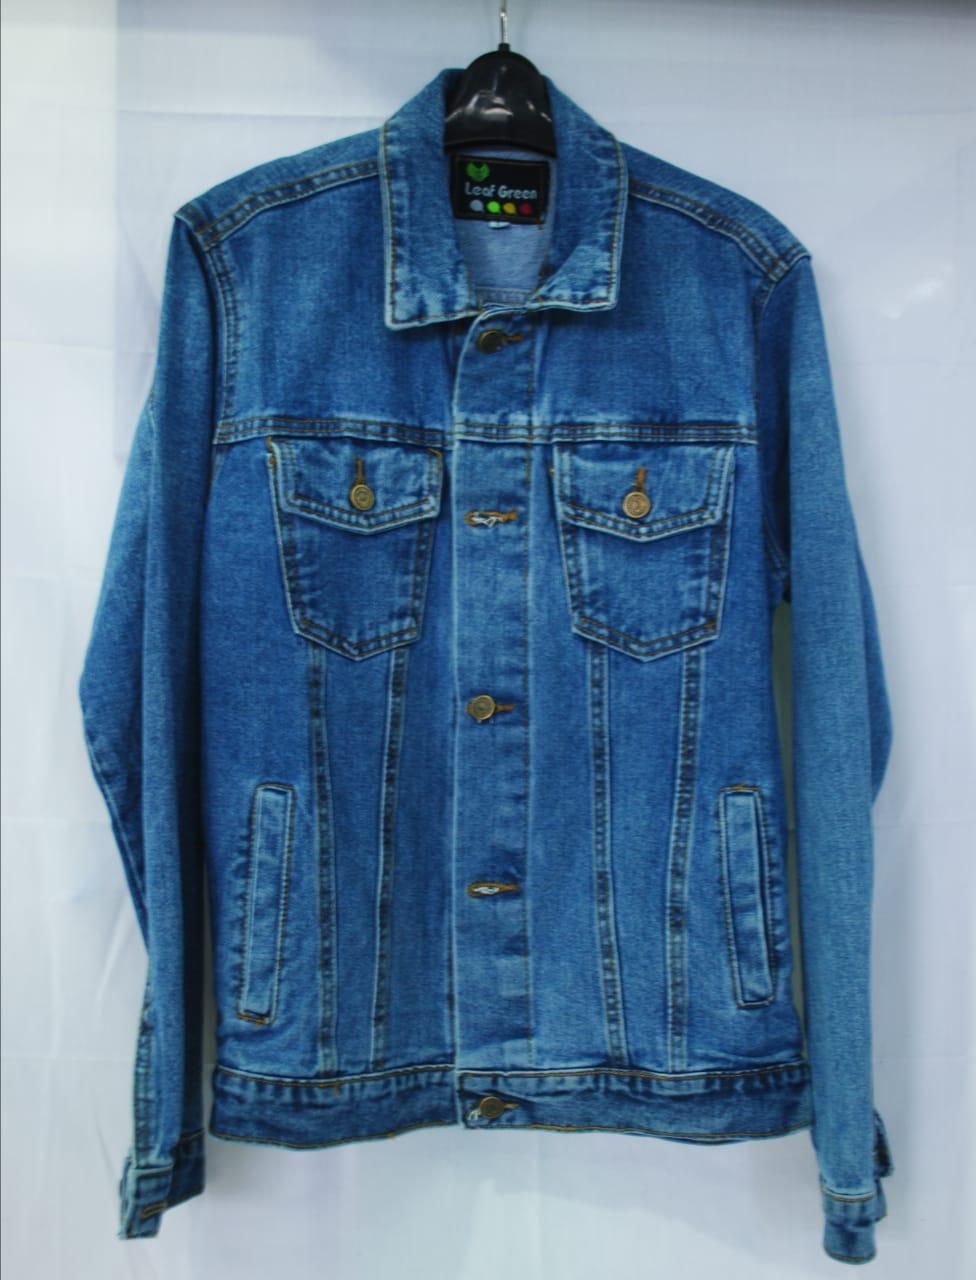 jaket jeans pria Dilan 1991 jaket levis jeans dilan  Fashion Pria -KZ7 Jaket sweater ninja - Navy -